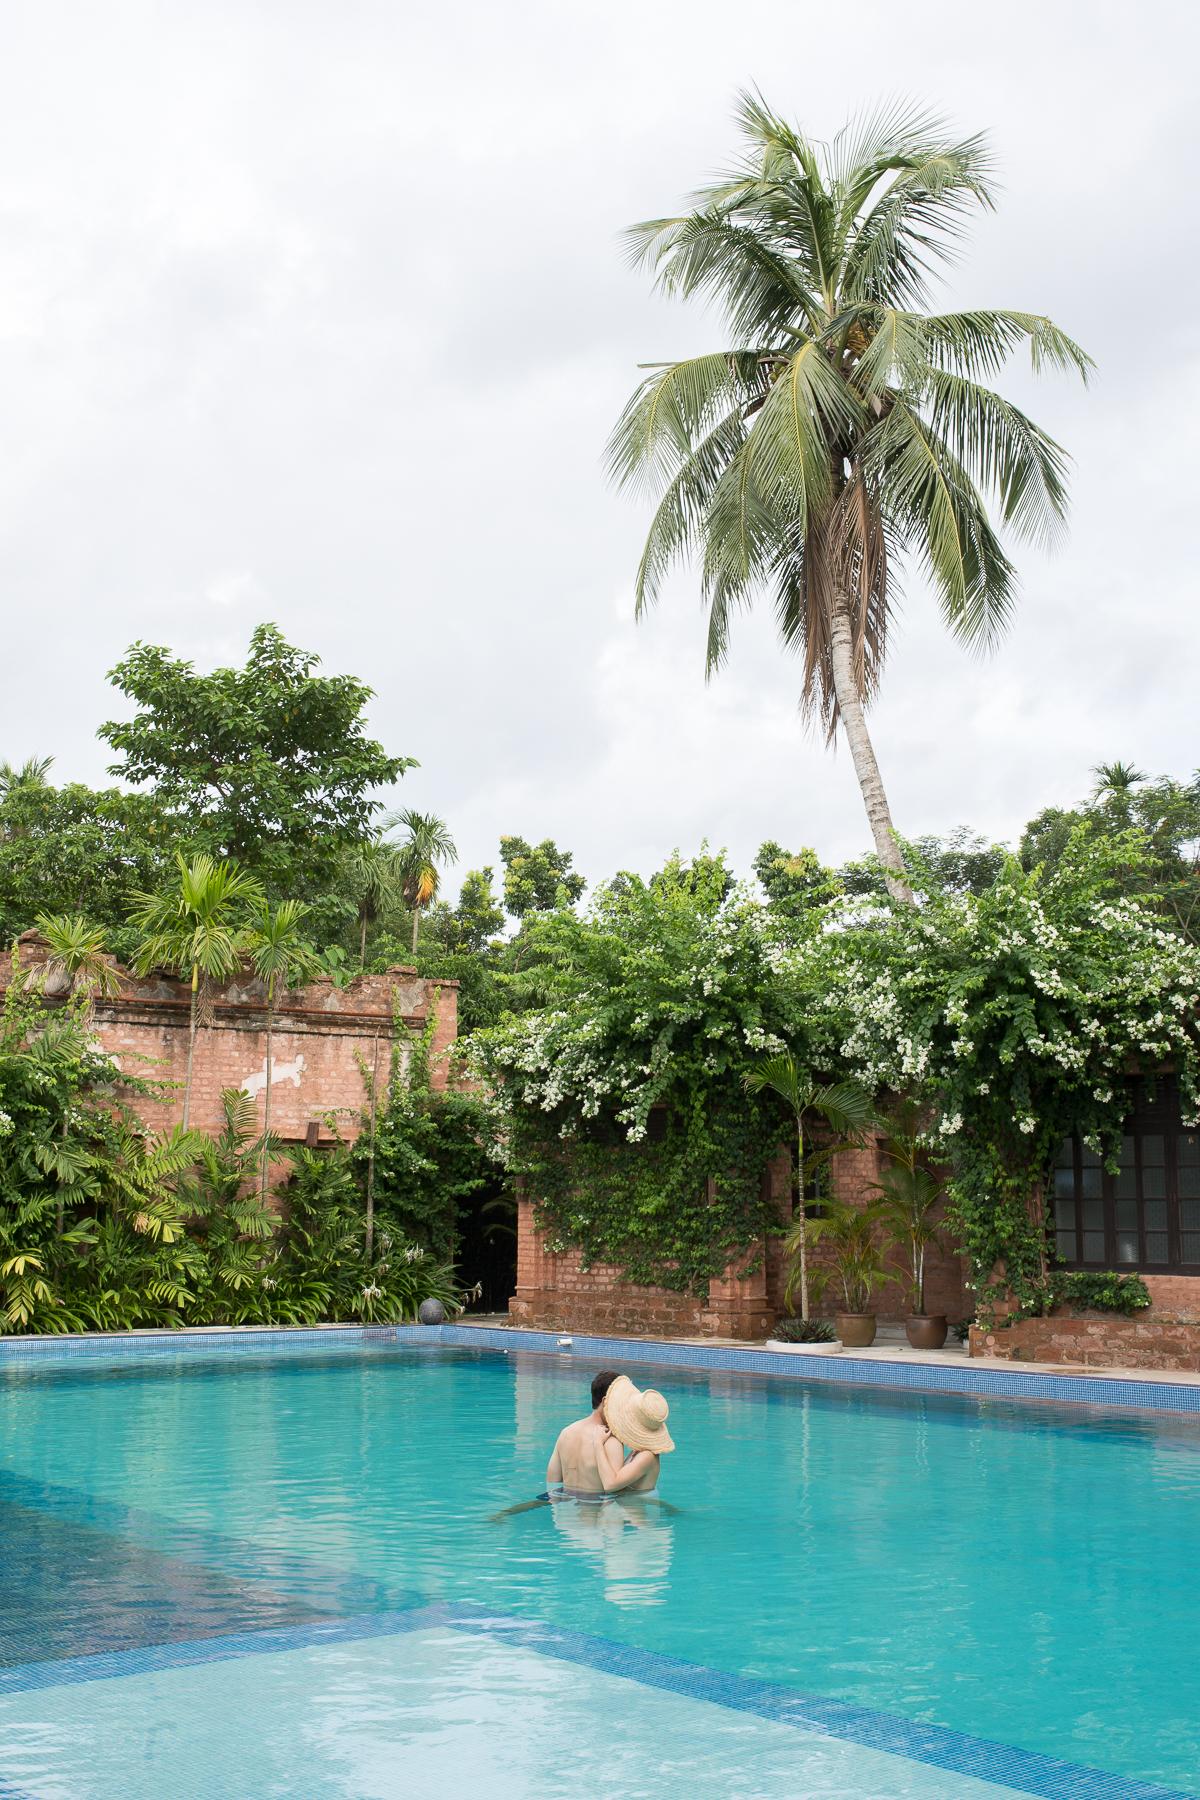 Stacie Flinner The Rajbari Bawali Heritage Hotel Calcutta-67.jpg